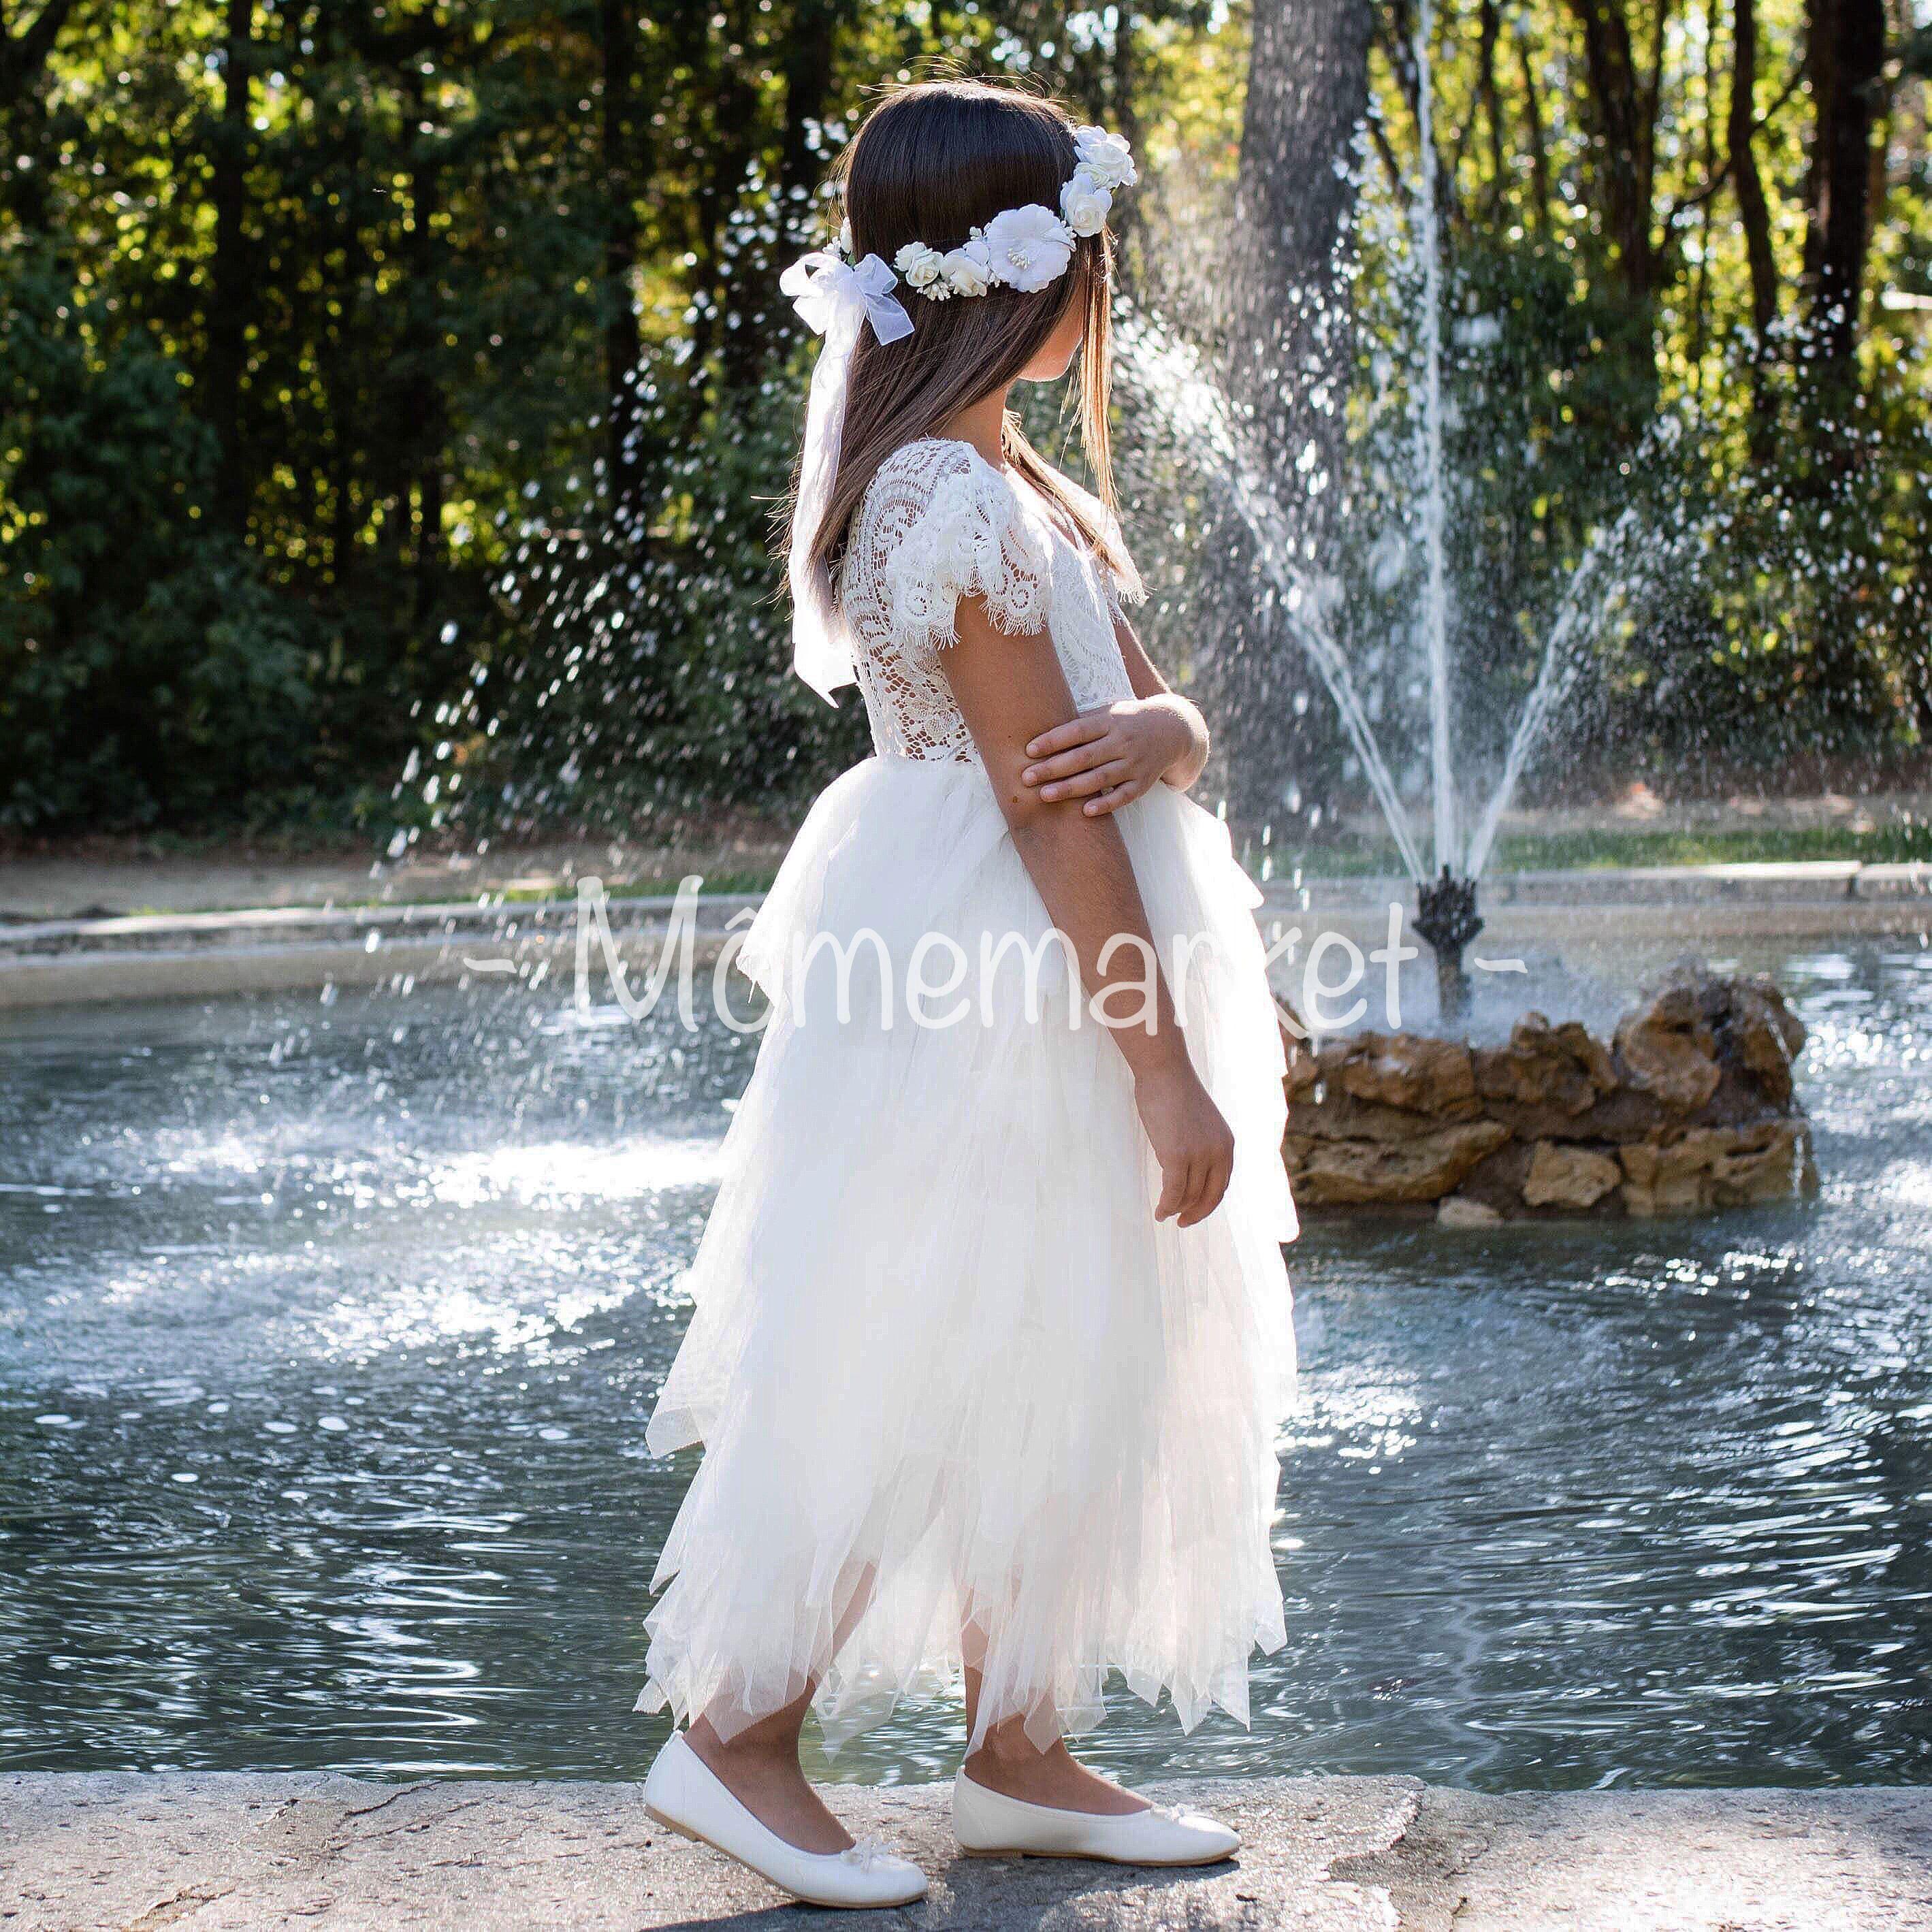 Demoiselle D Honneur Demoiselle D Honneur Robe De Mariee Idees Vestimentaires